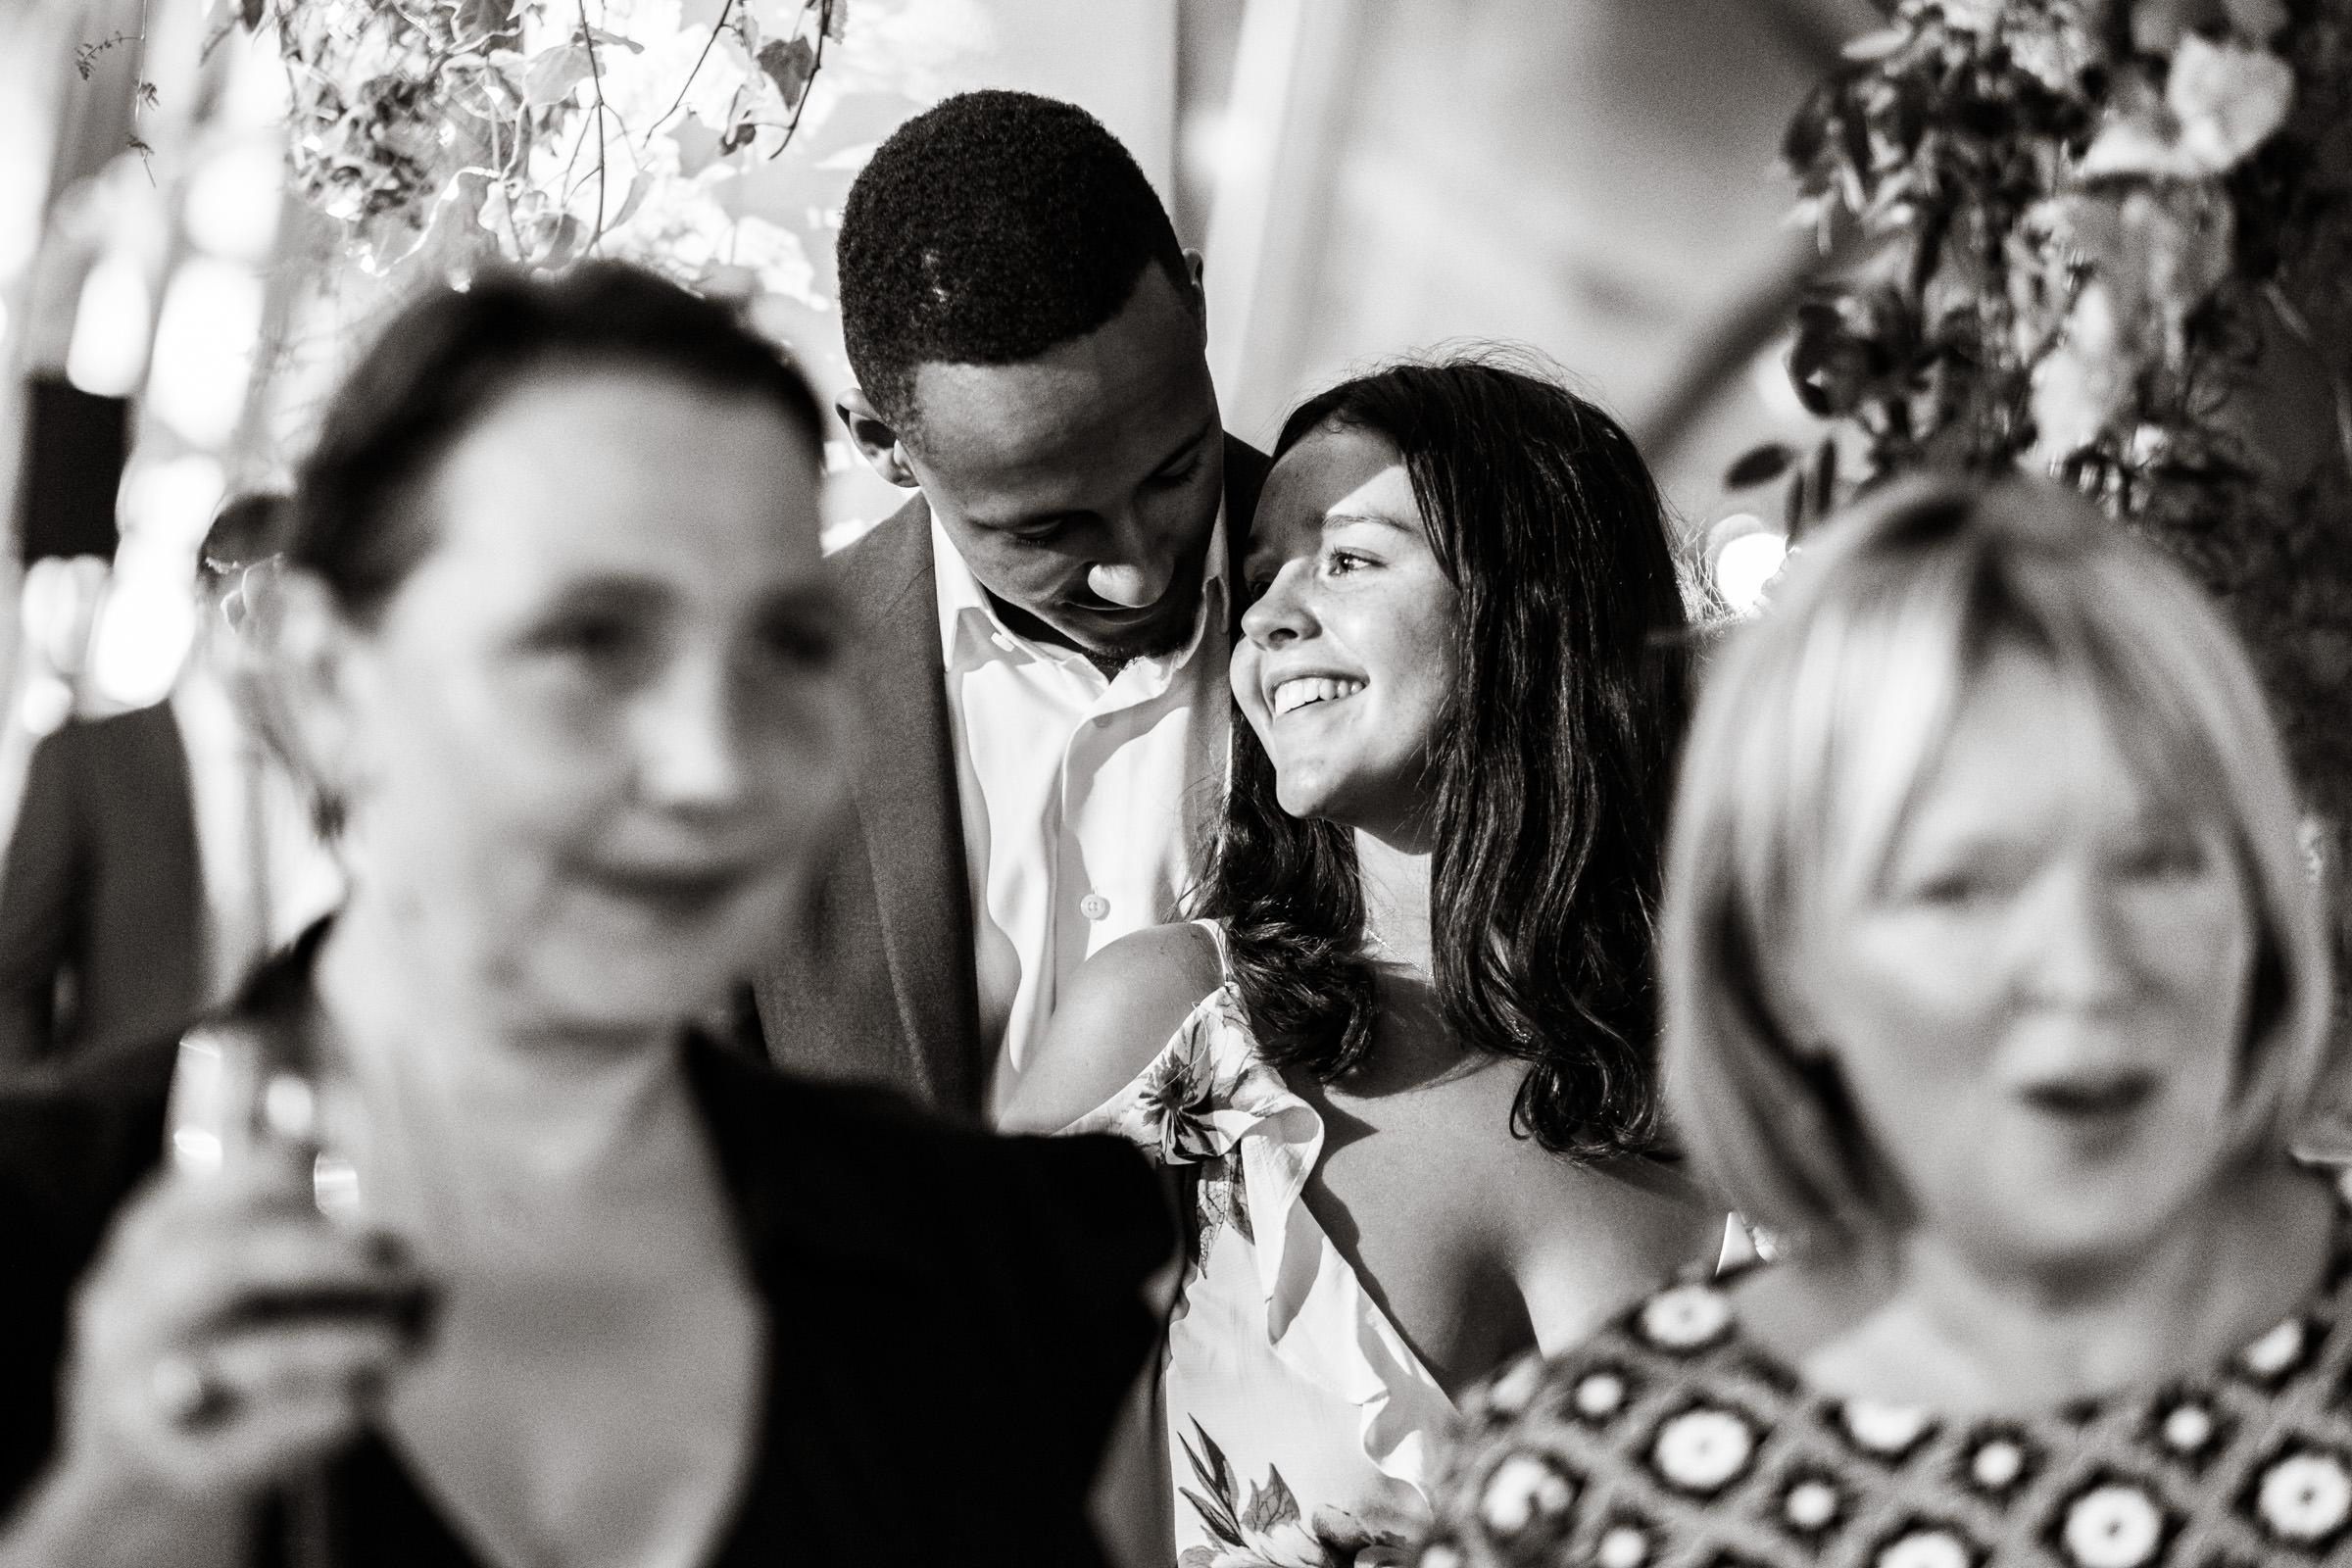 Wedding+Photography+At+The+Art+Pavilion+Mile+End+032.jpg